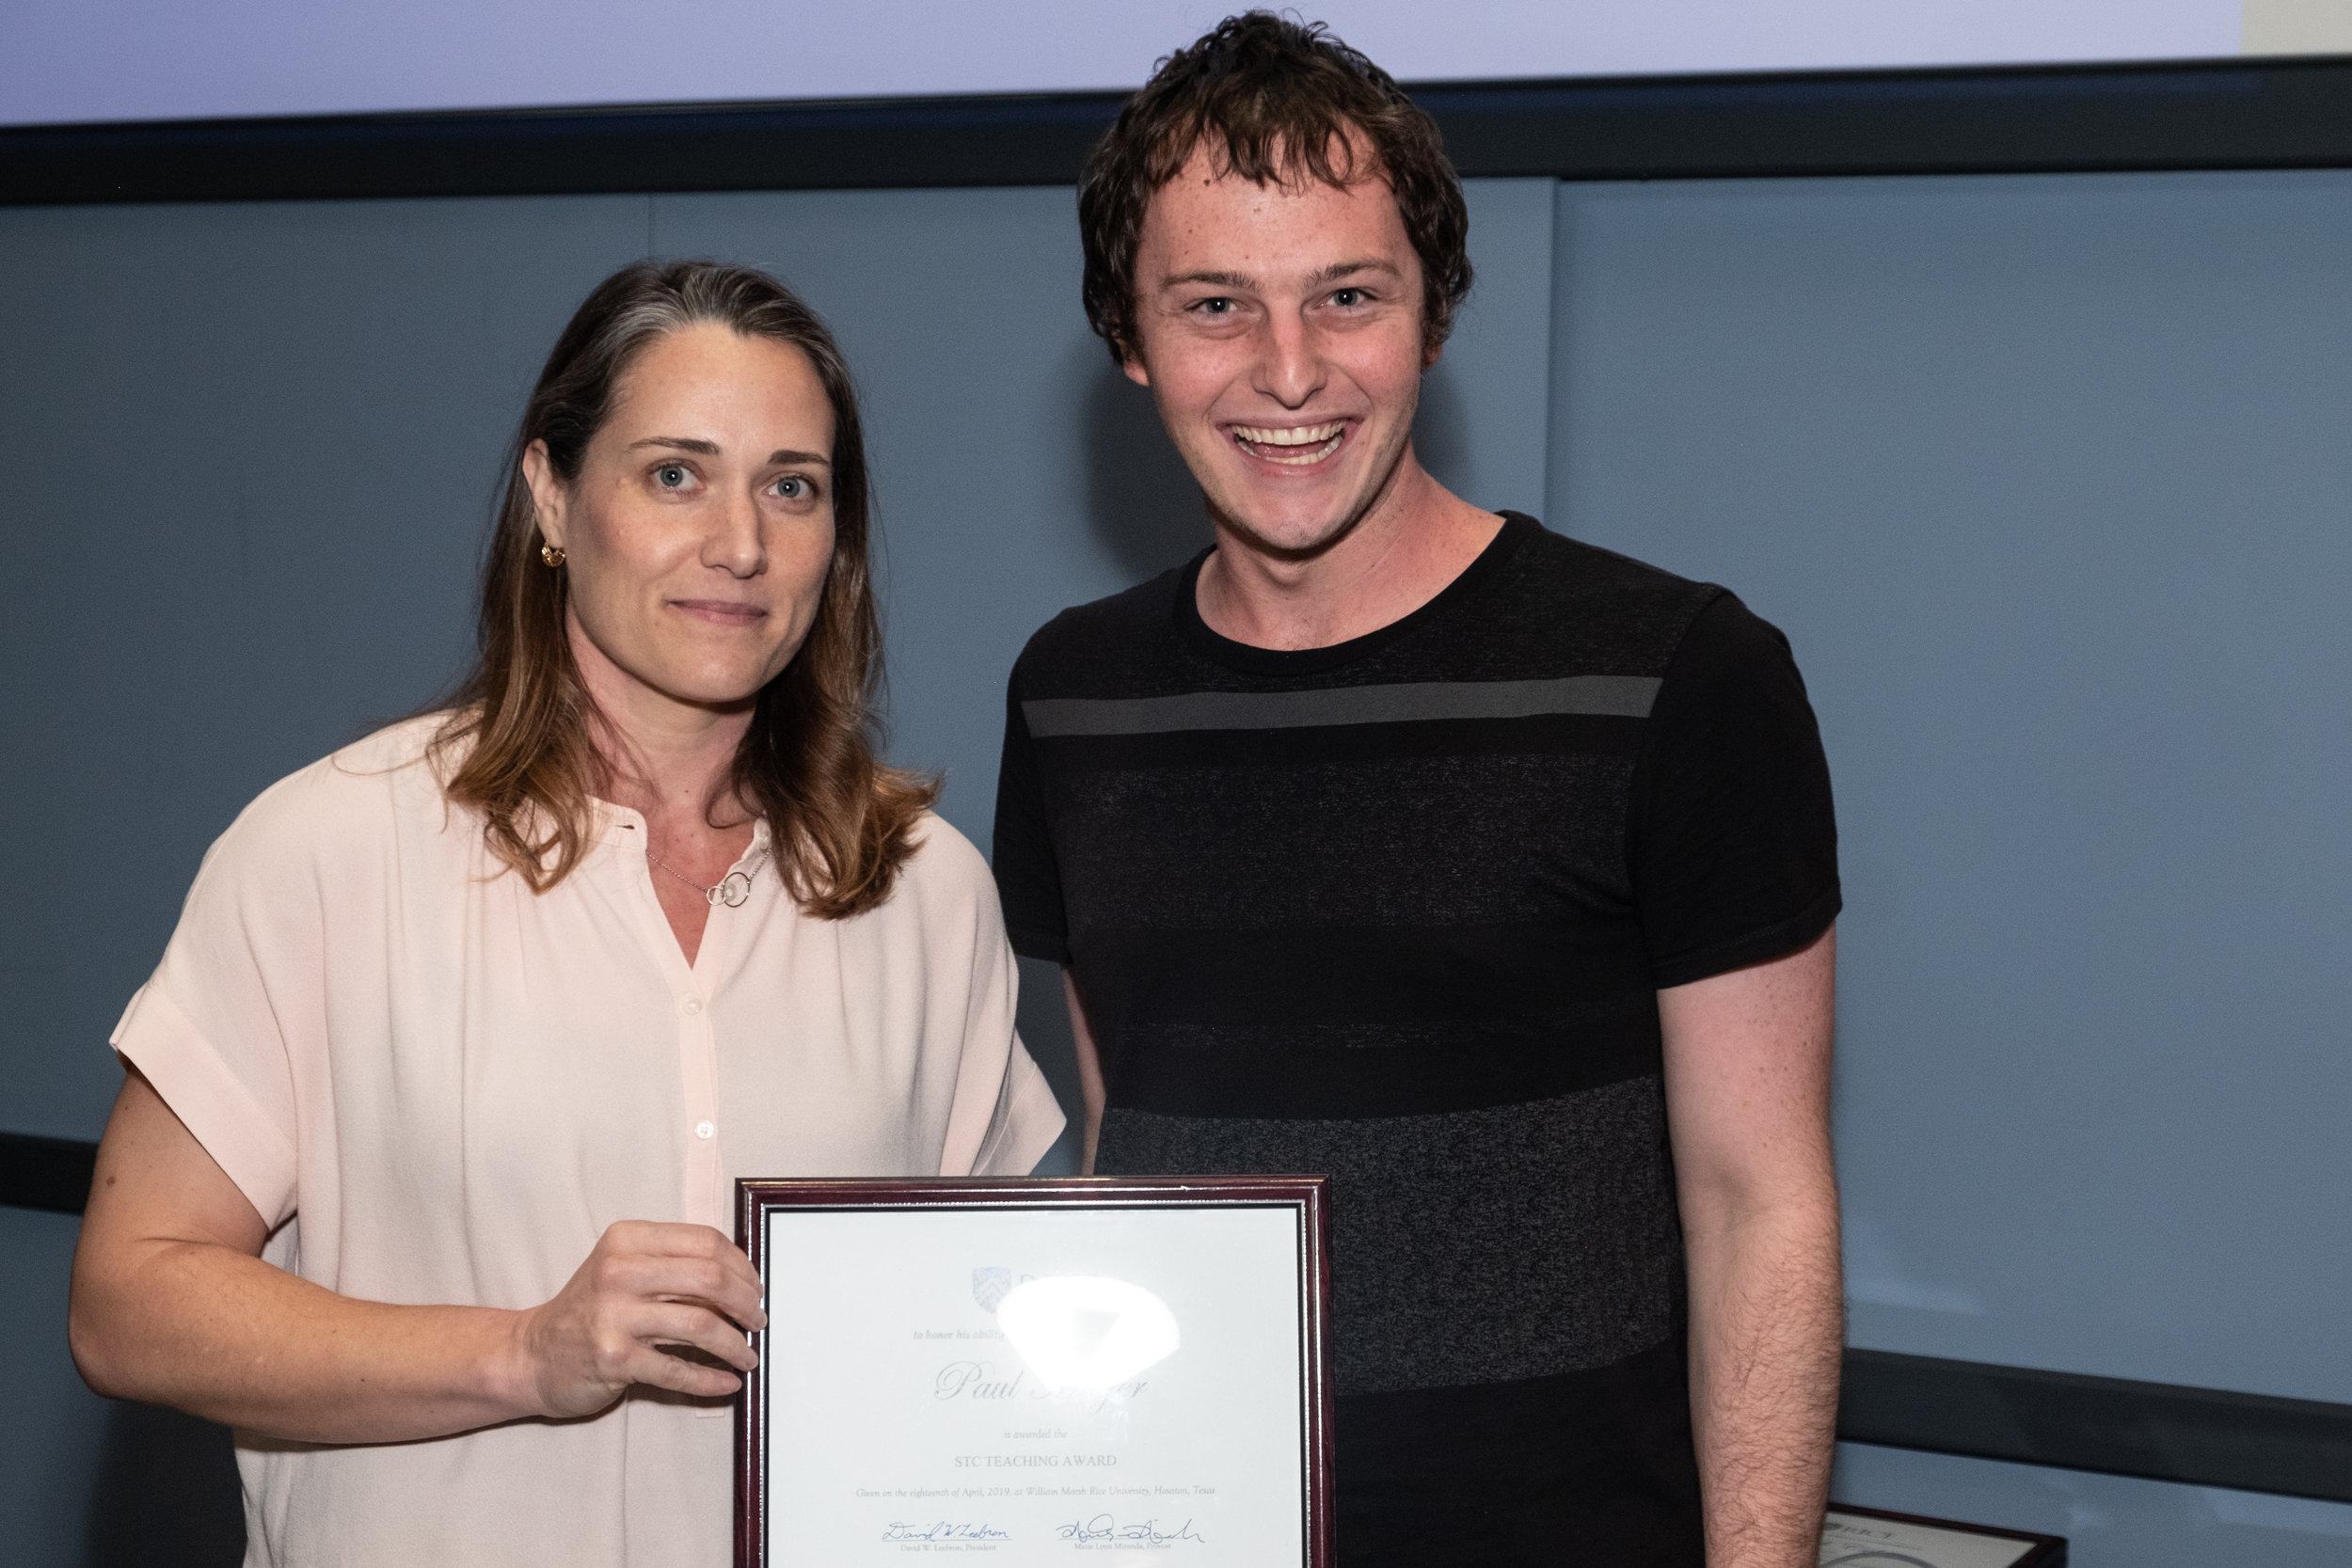 Robin Paige, CTE Senior Associate Director & Paul Mayer, STC Teaching Award